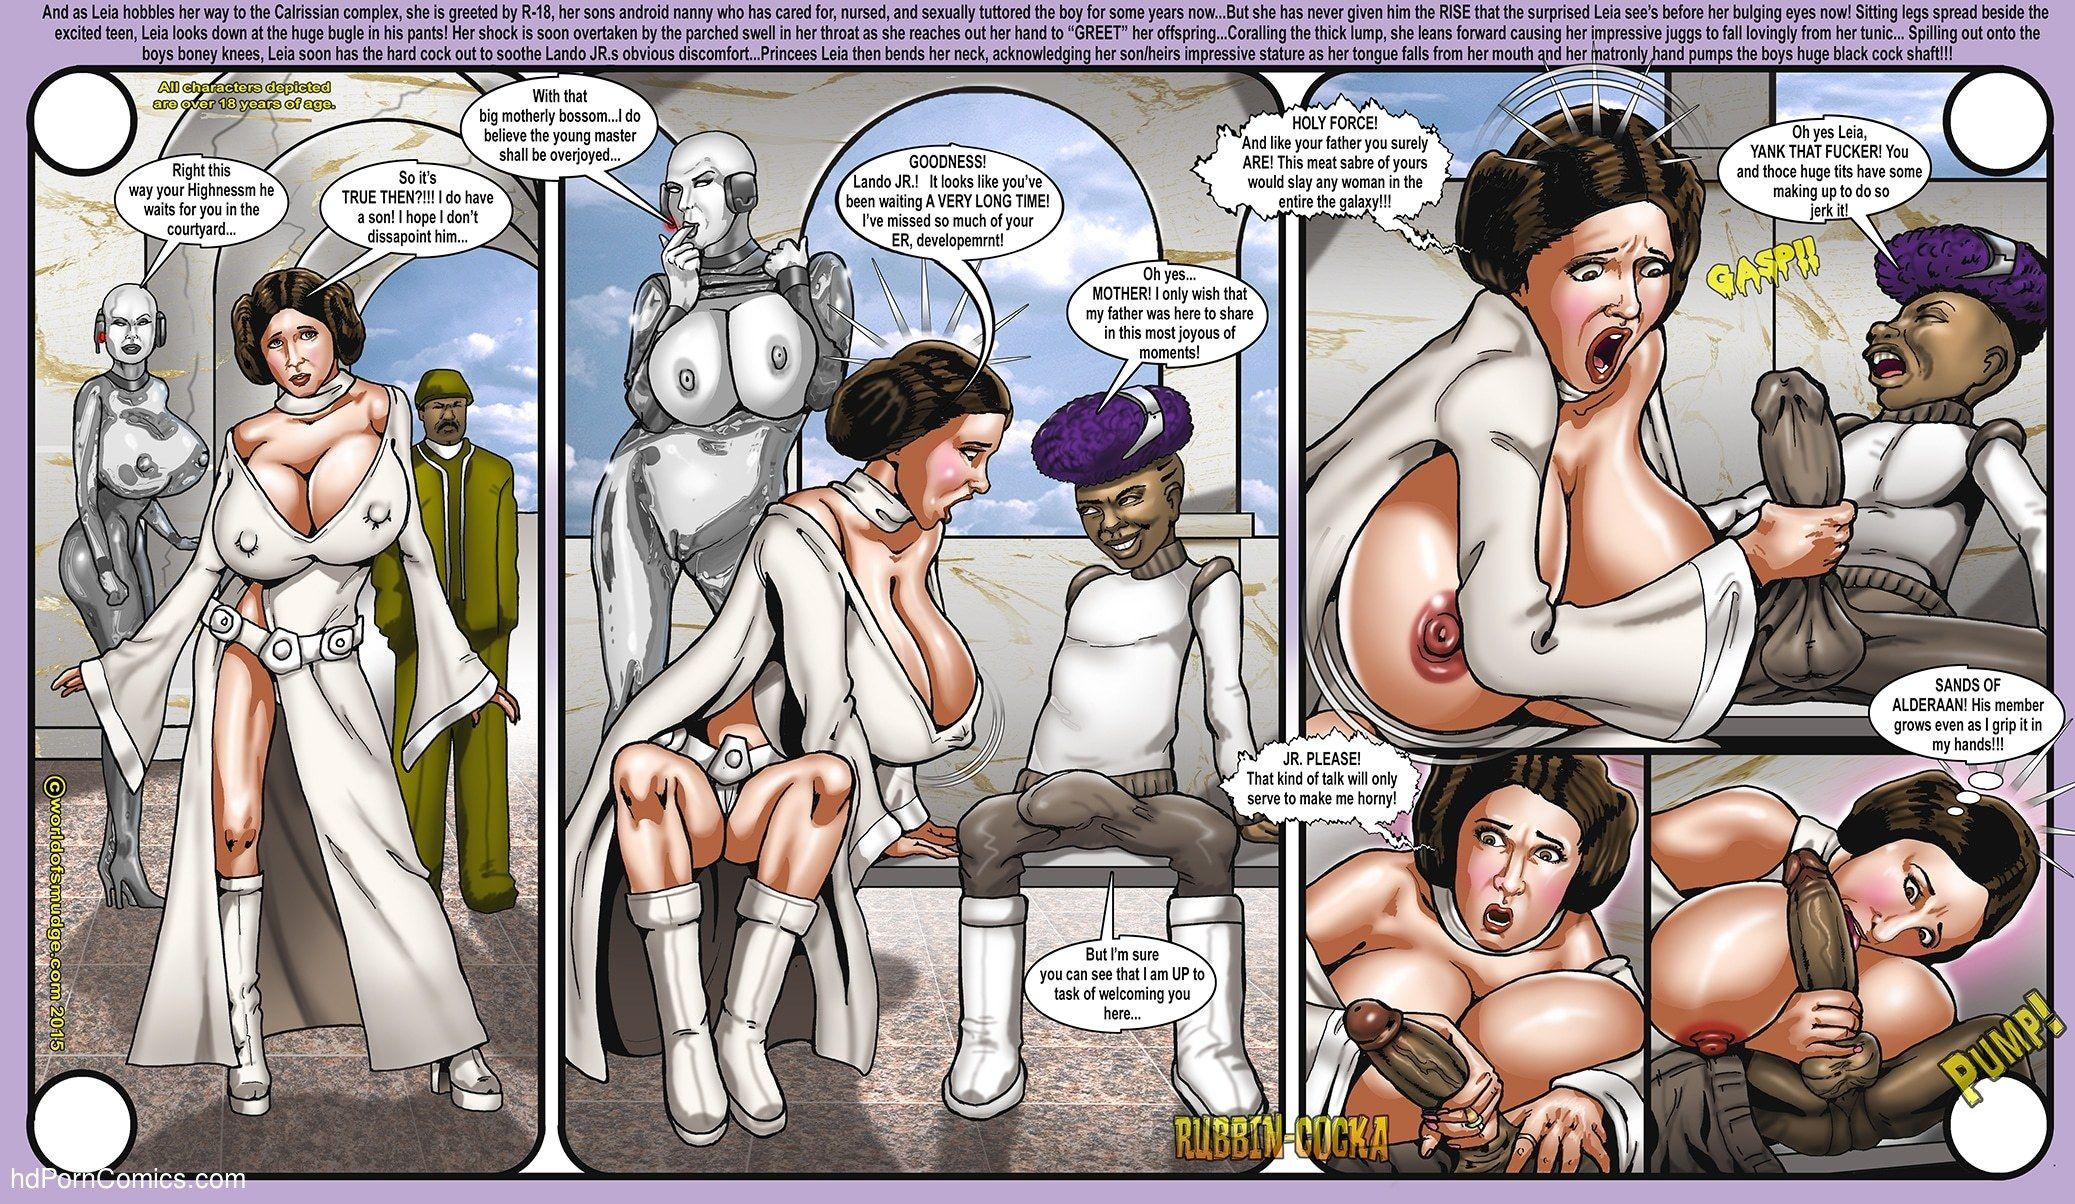 Leia star wars porn Princess Leia